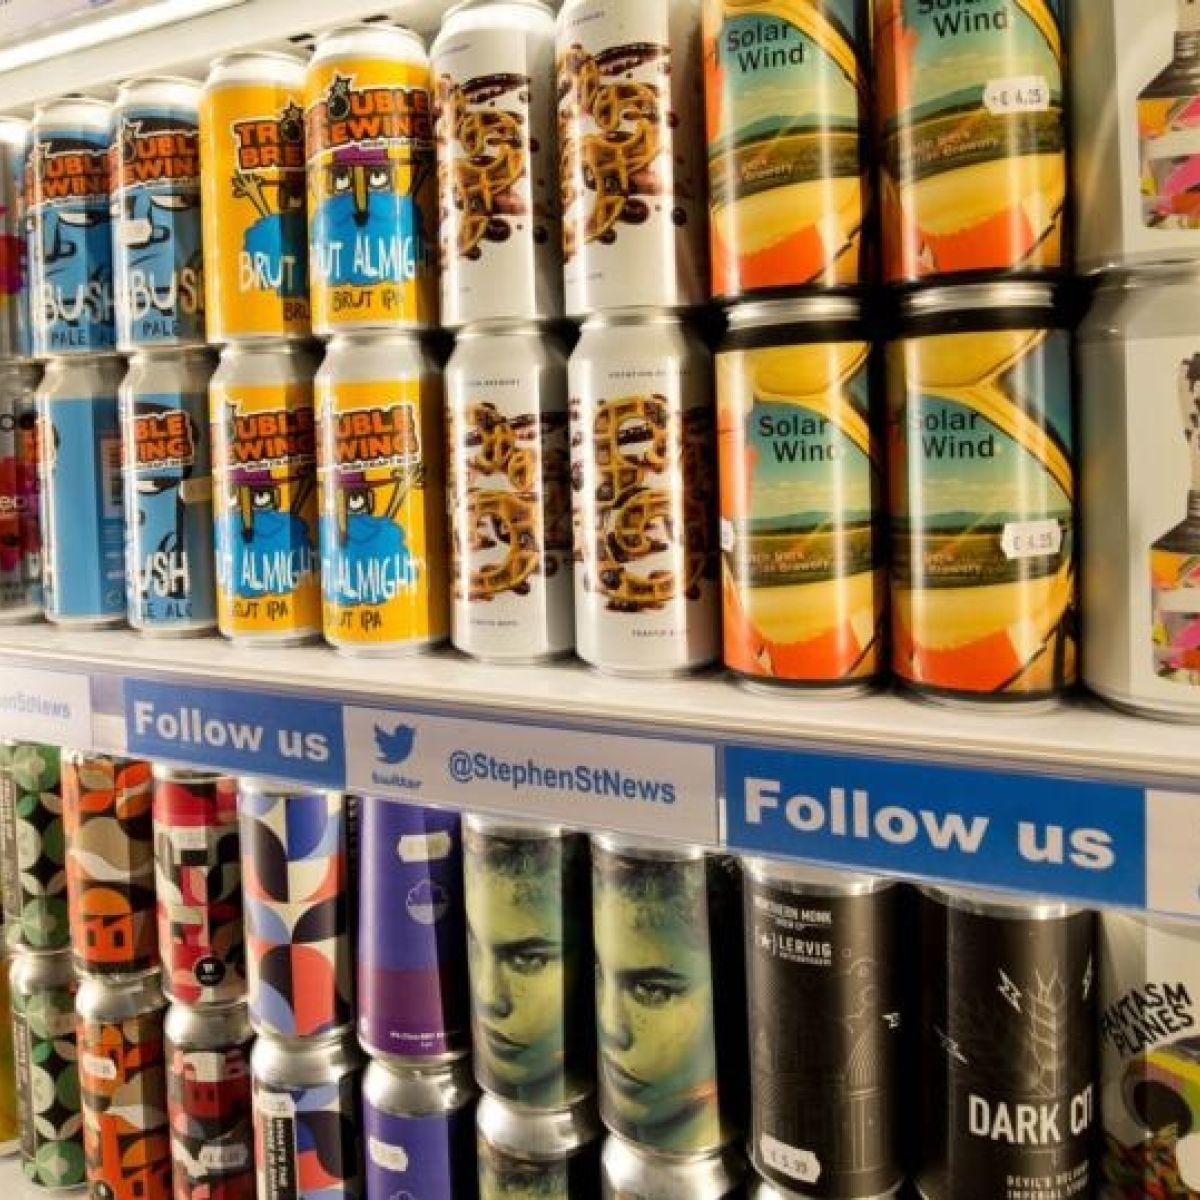 irishtimes.com - Sorcha Hamilton - Is the craft beer industry sustainable?